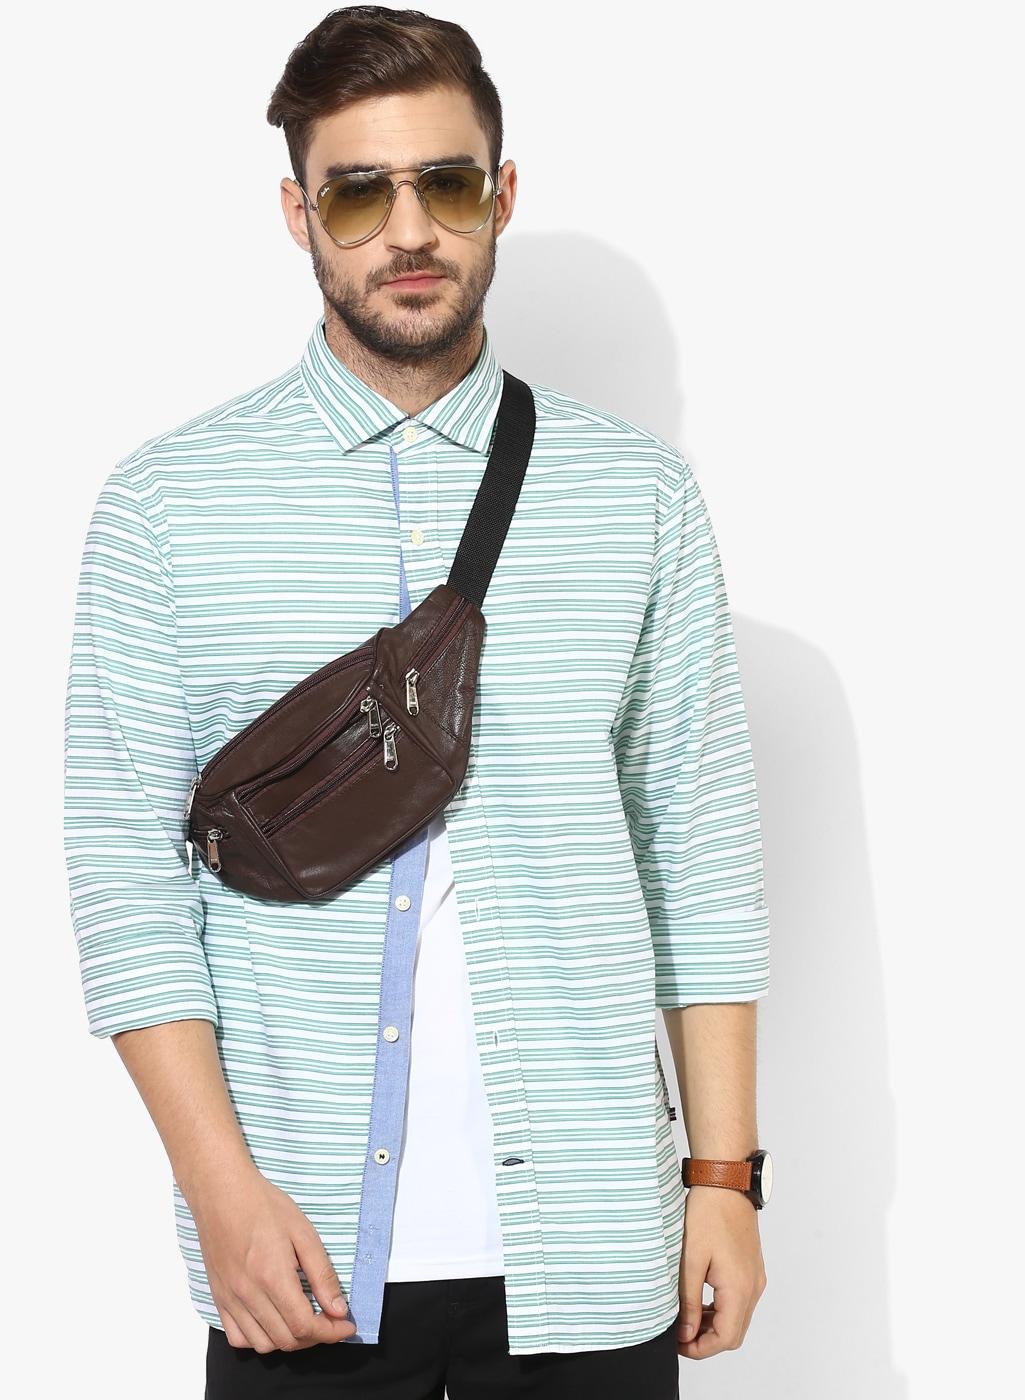 bc83cc67e13 Buy Tie Rack London Men White Slim Fit Formal Shirt With Tie ...